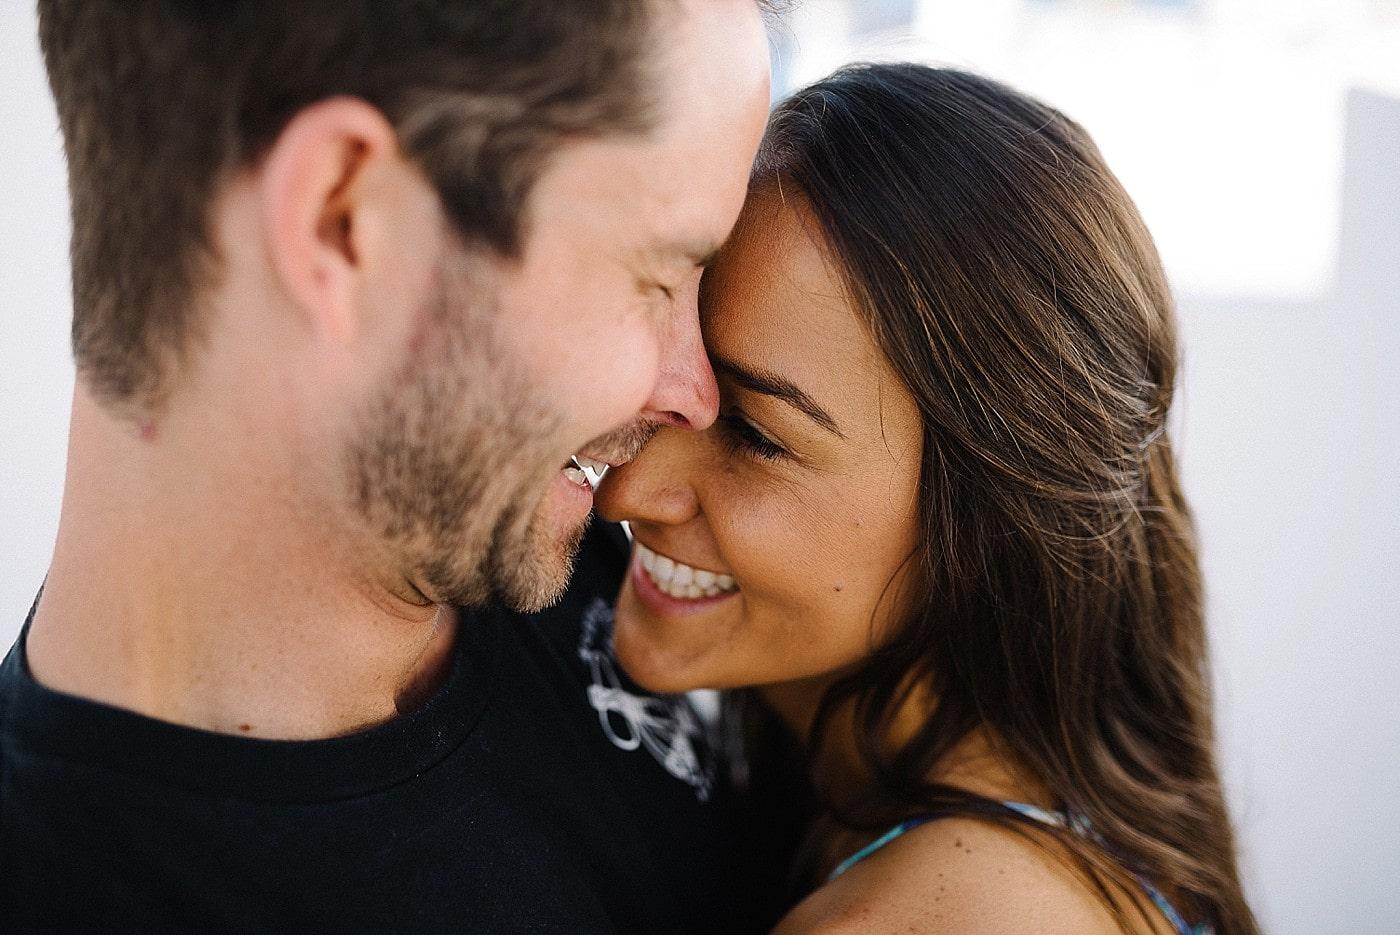 santorini-engagement-photography-elopement-wedding-photographer_0017